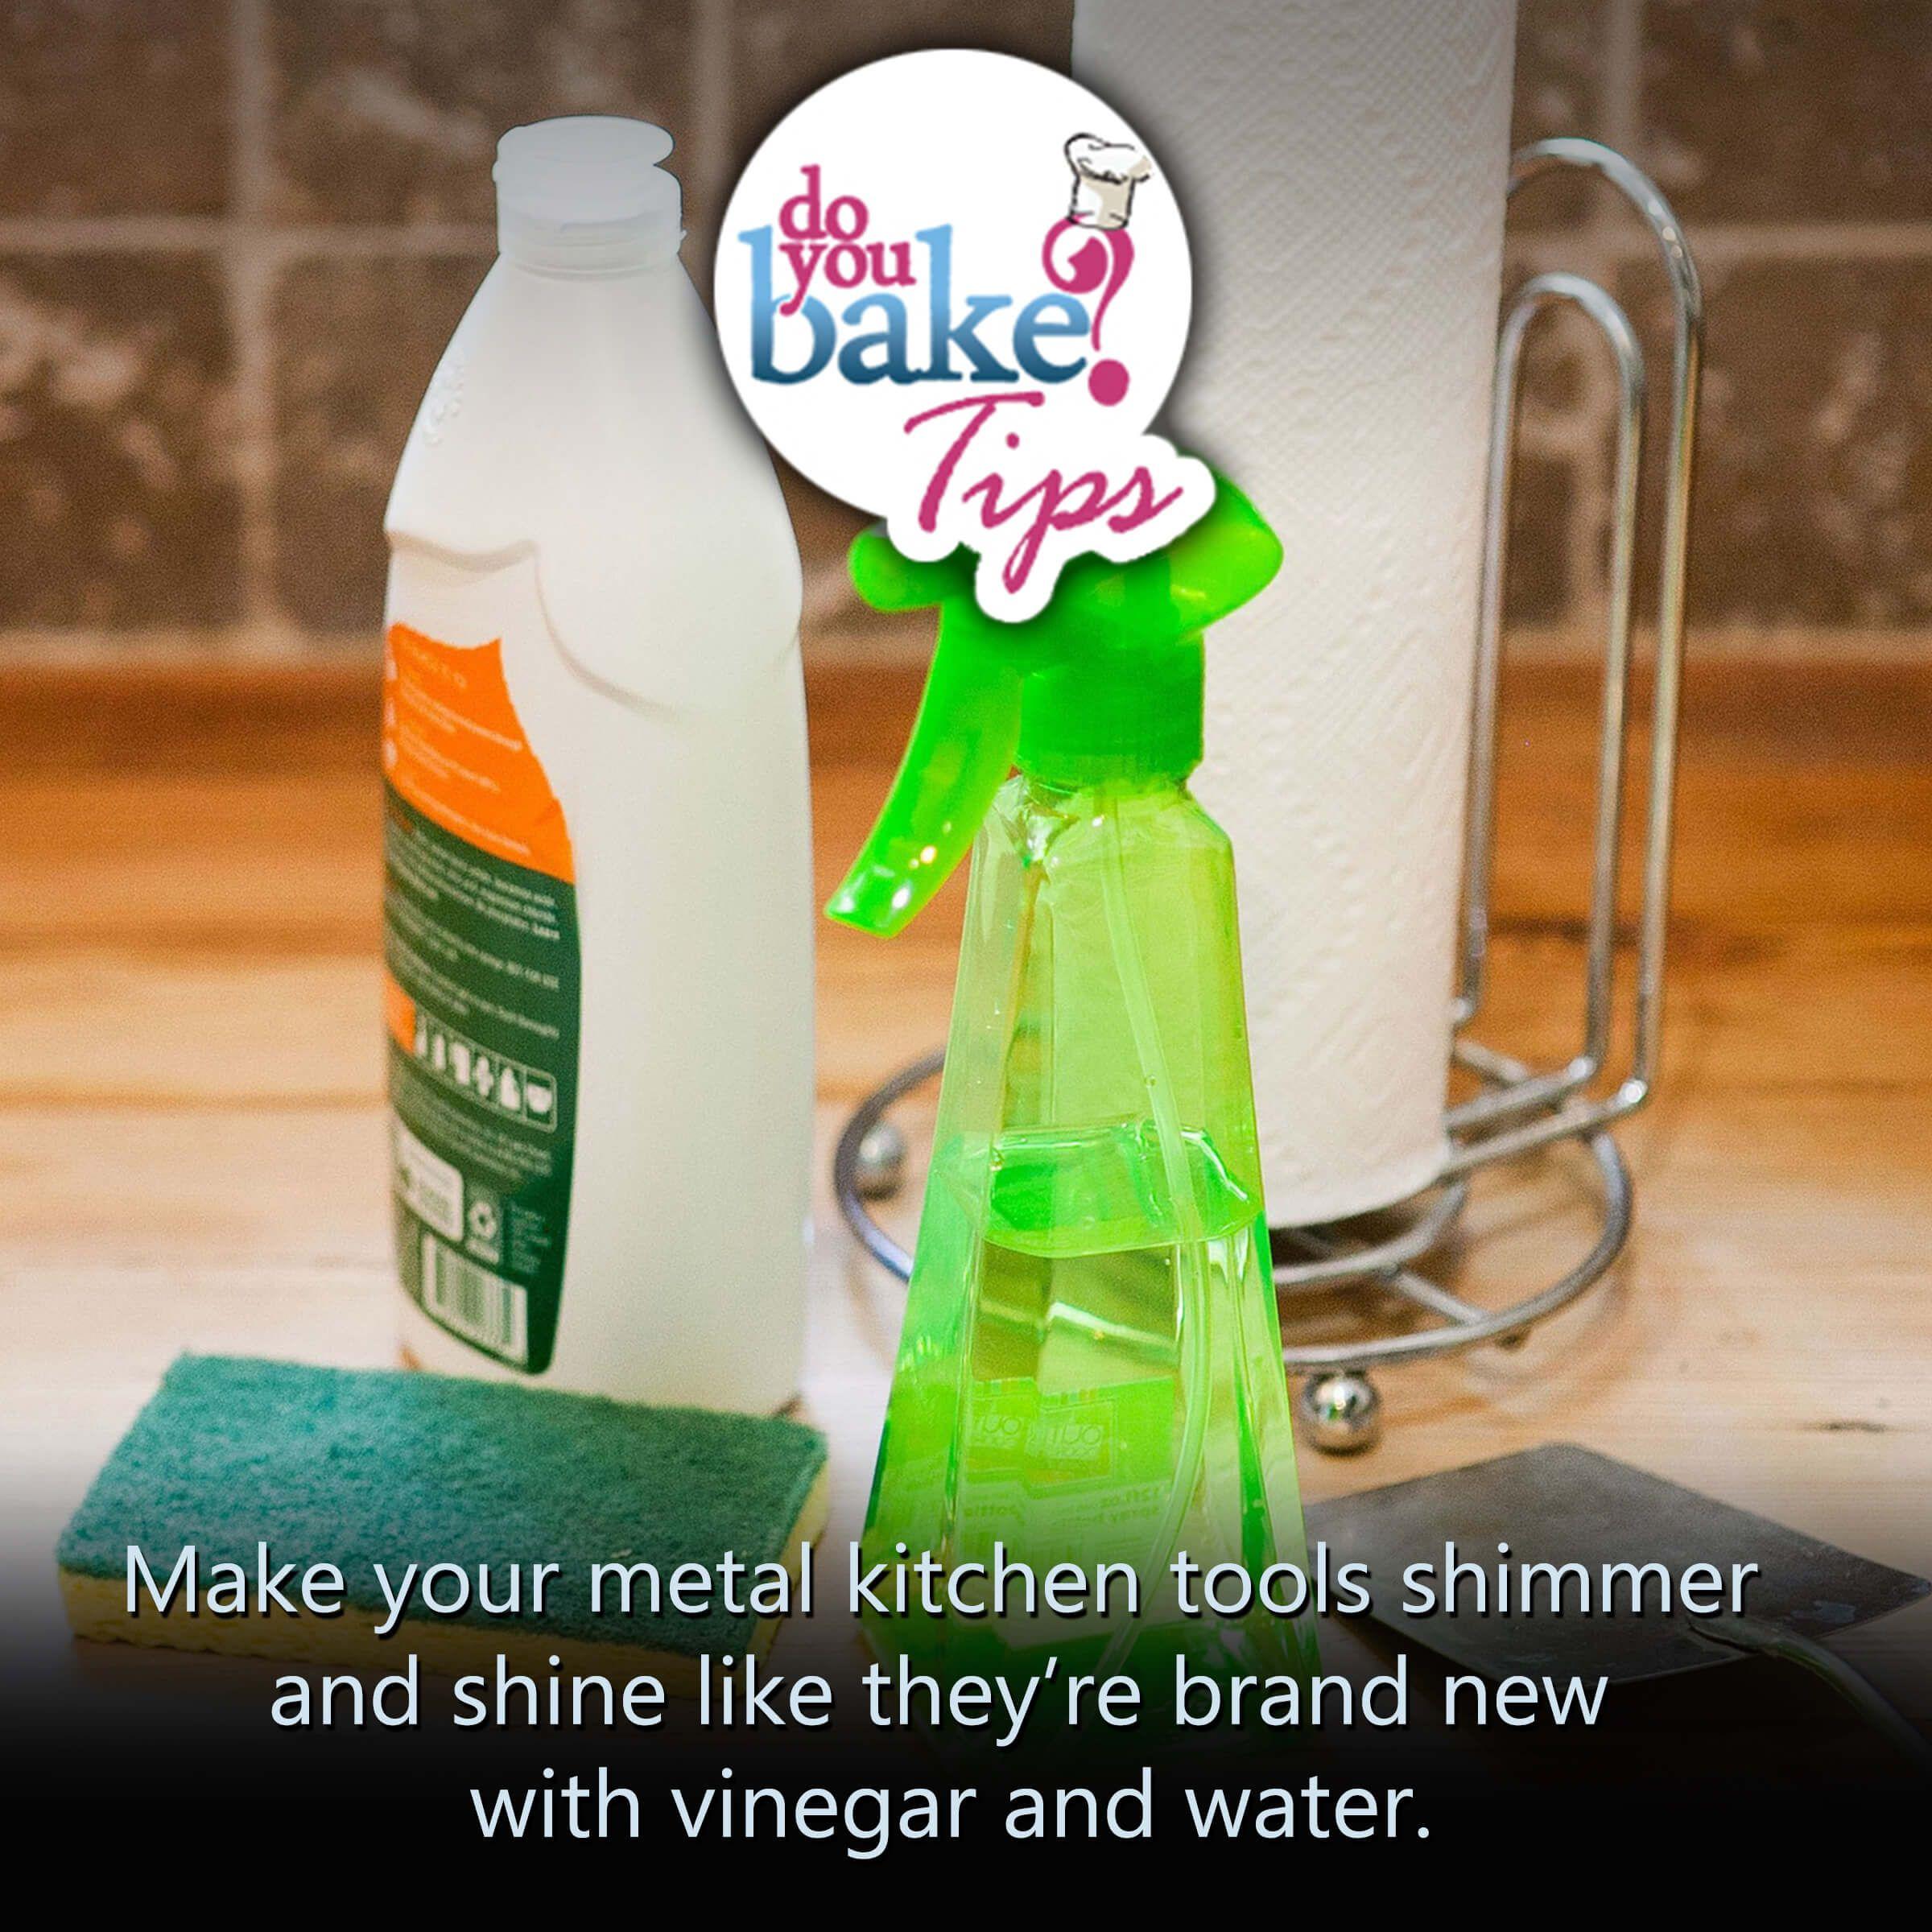 Make An Electric Kettle Glimmer Diysurvival #Diysurvival #Cleaning #Tip #Hack